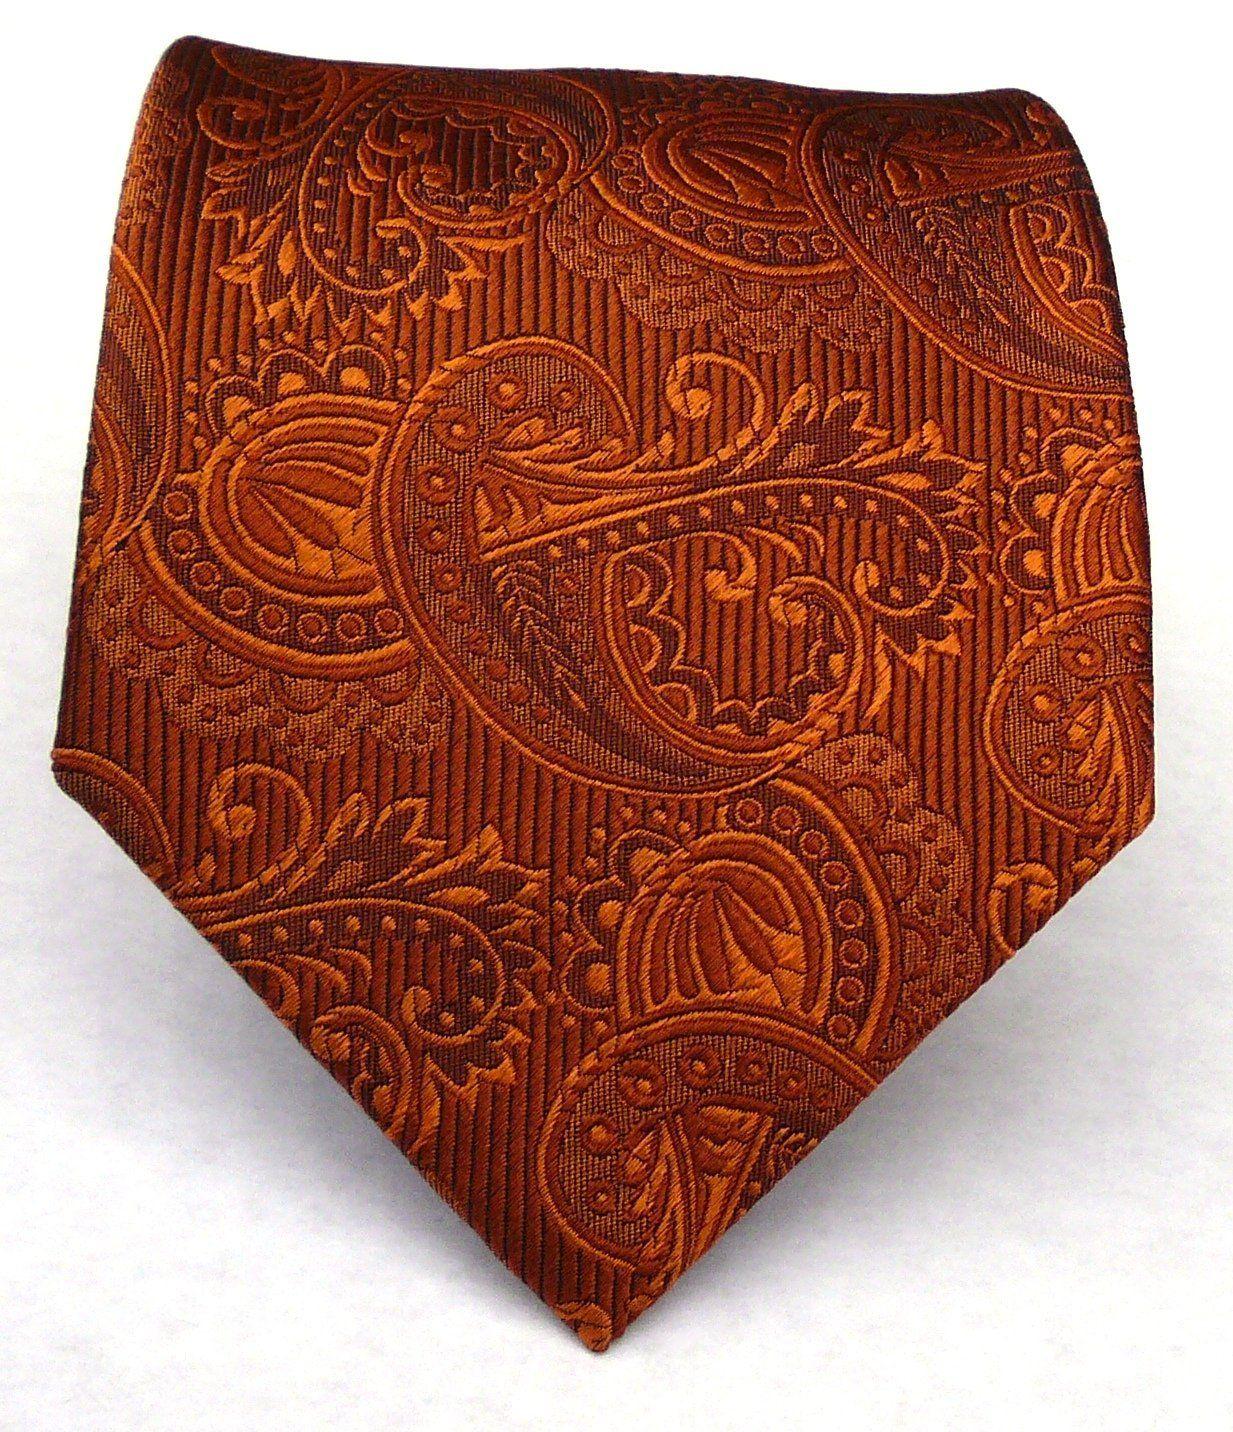 Silk Woven Burnt Orange (Rust) Paisley Tie: Rich, Gorgeous